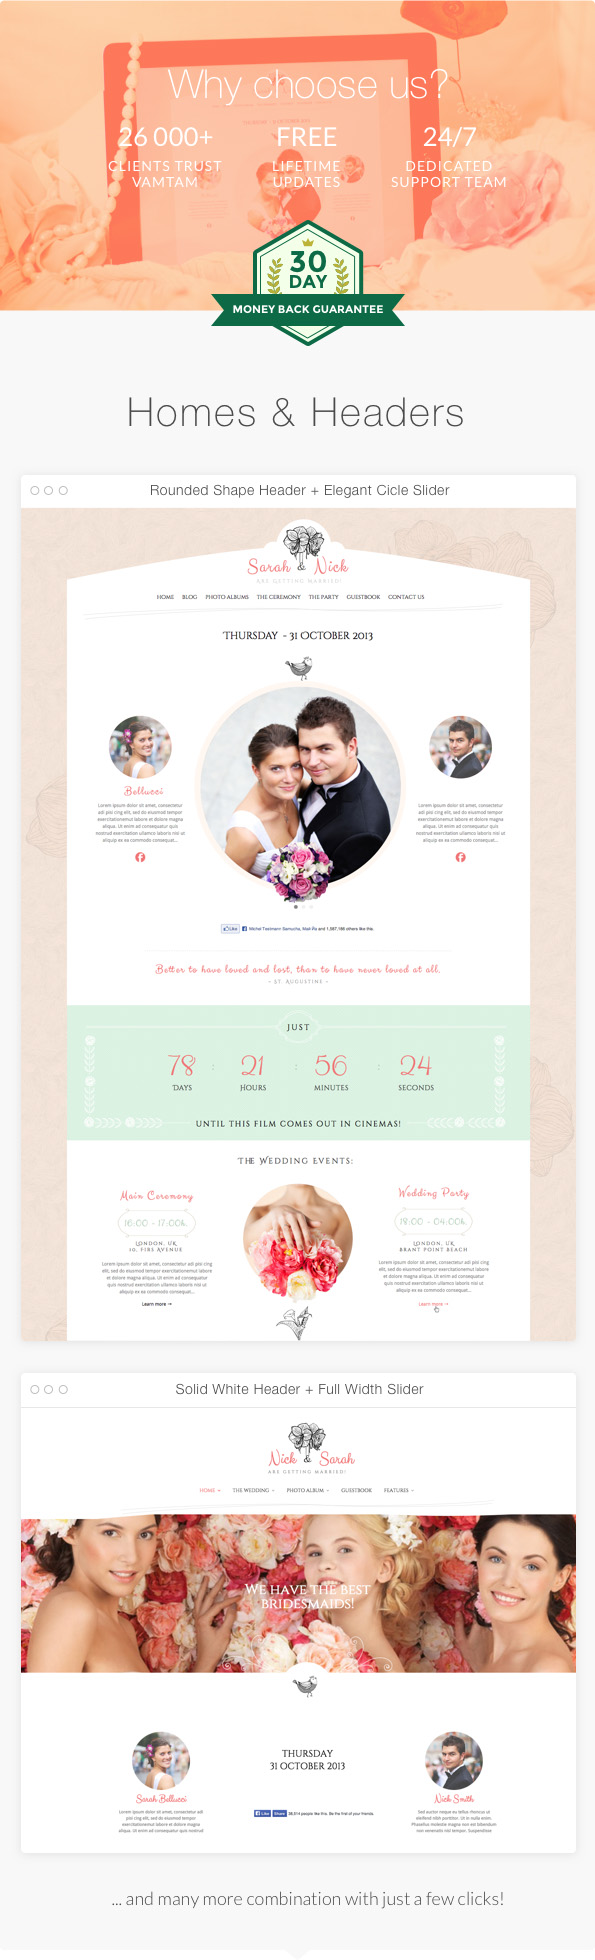 The Wedding Day Wedding Wedding Planner by vamtam ThemeForest